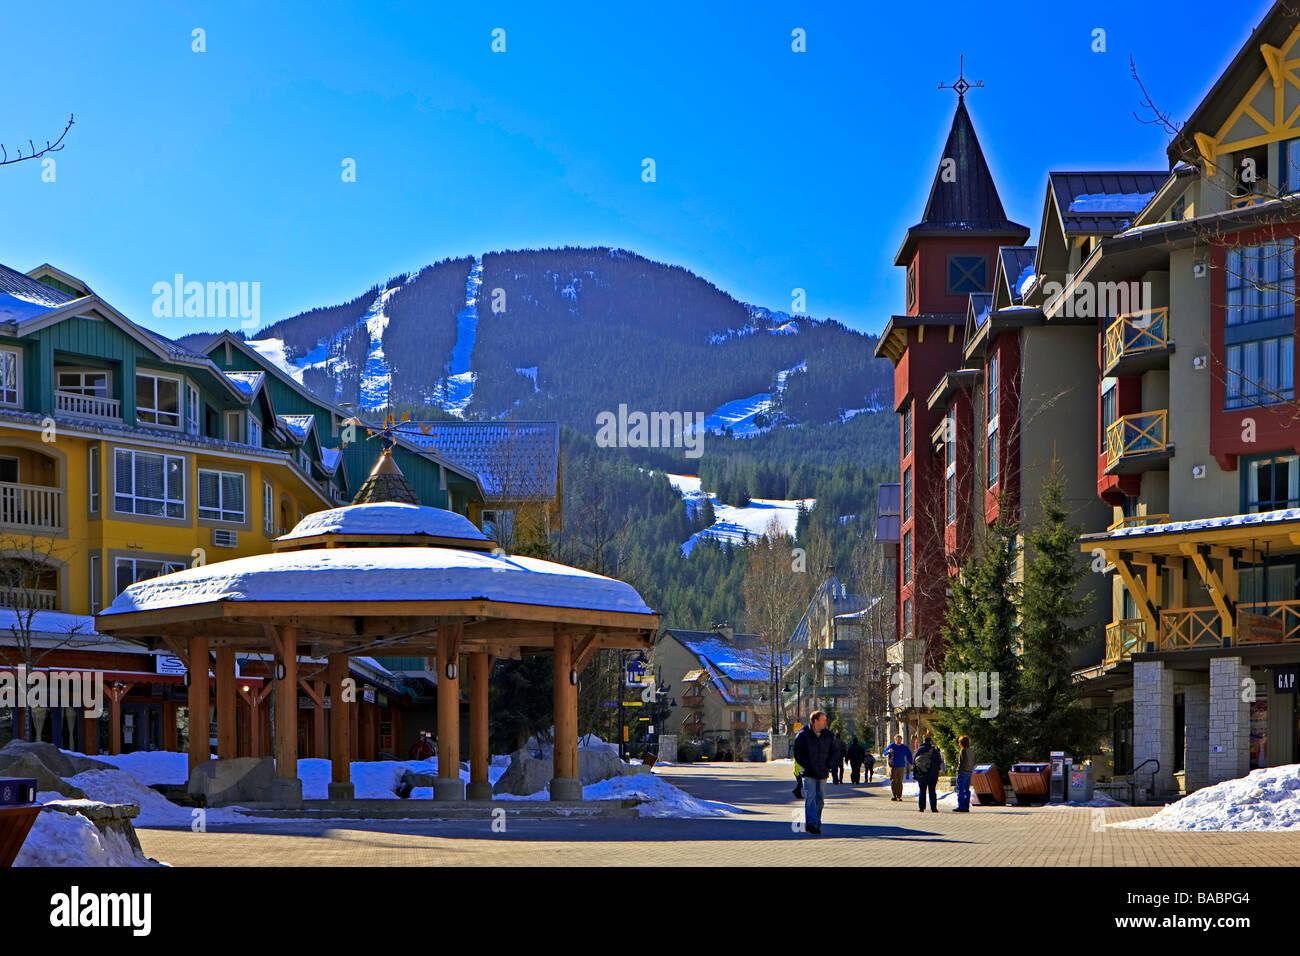 Gazebo in the Town Plaza,Whistler Village,Canada. - Stock Image